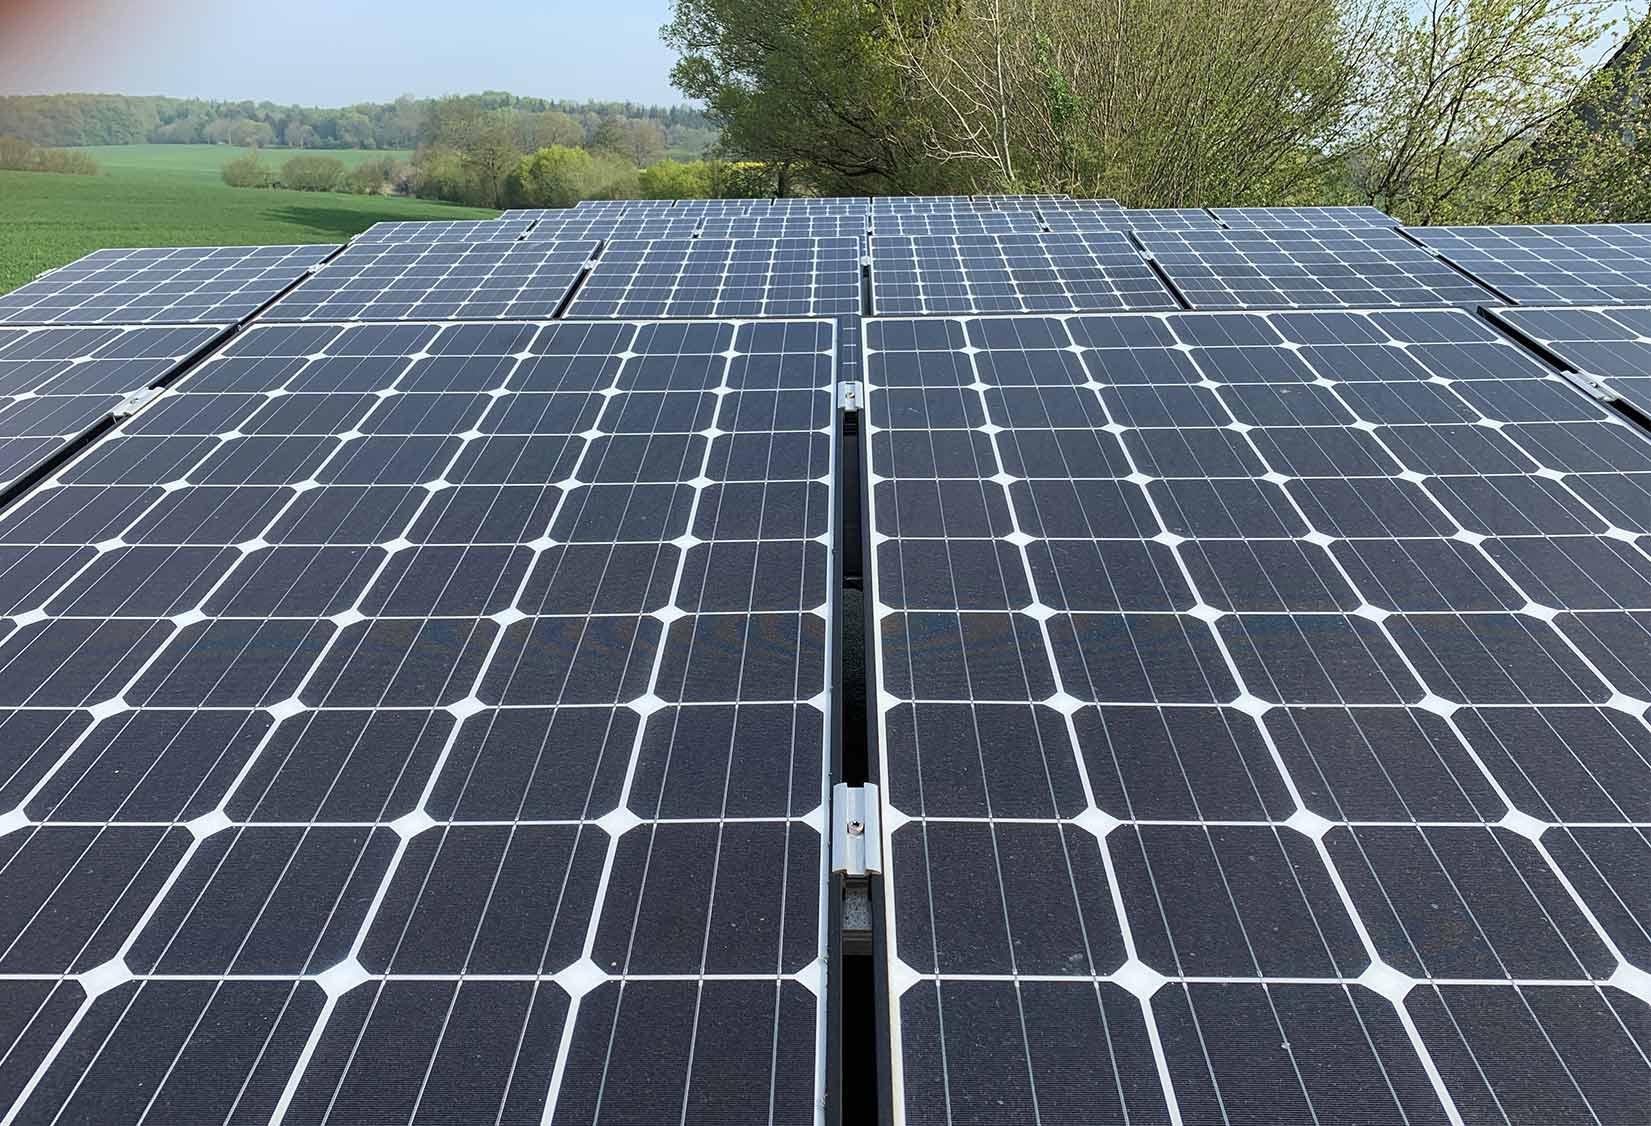 Erneuerbare energien solarzellen wald hamburg